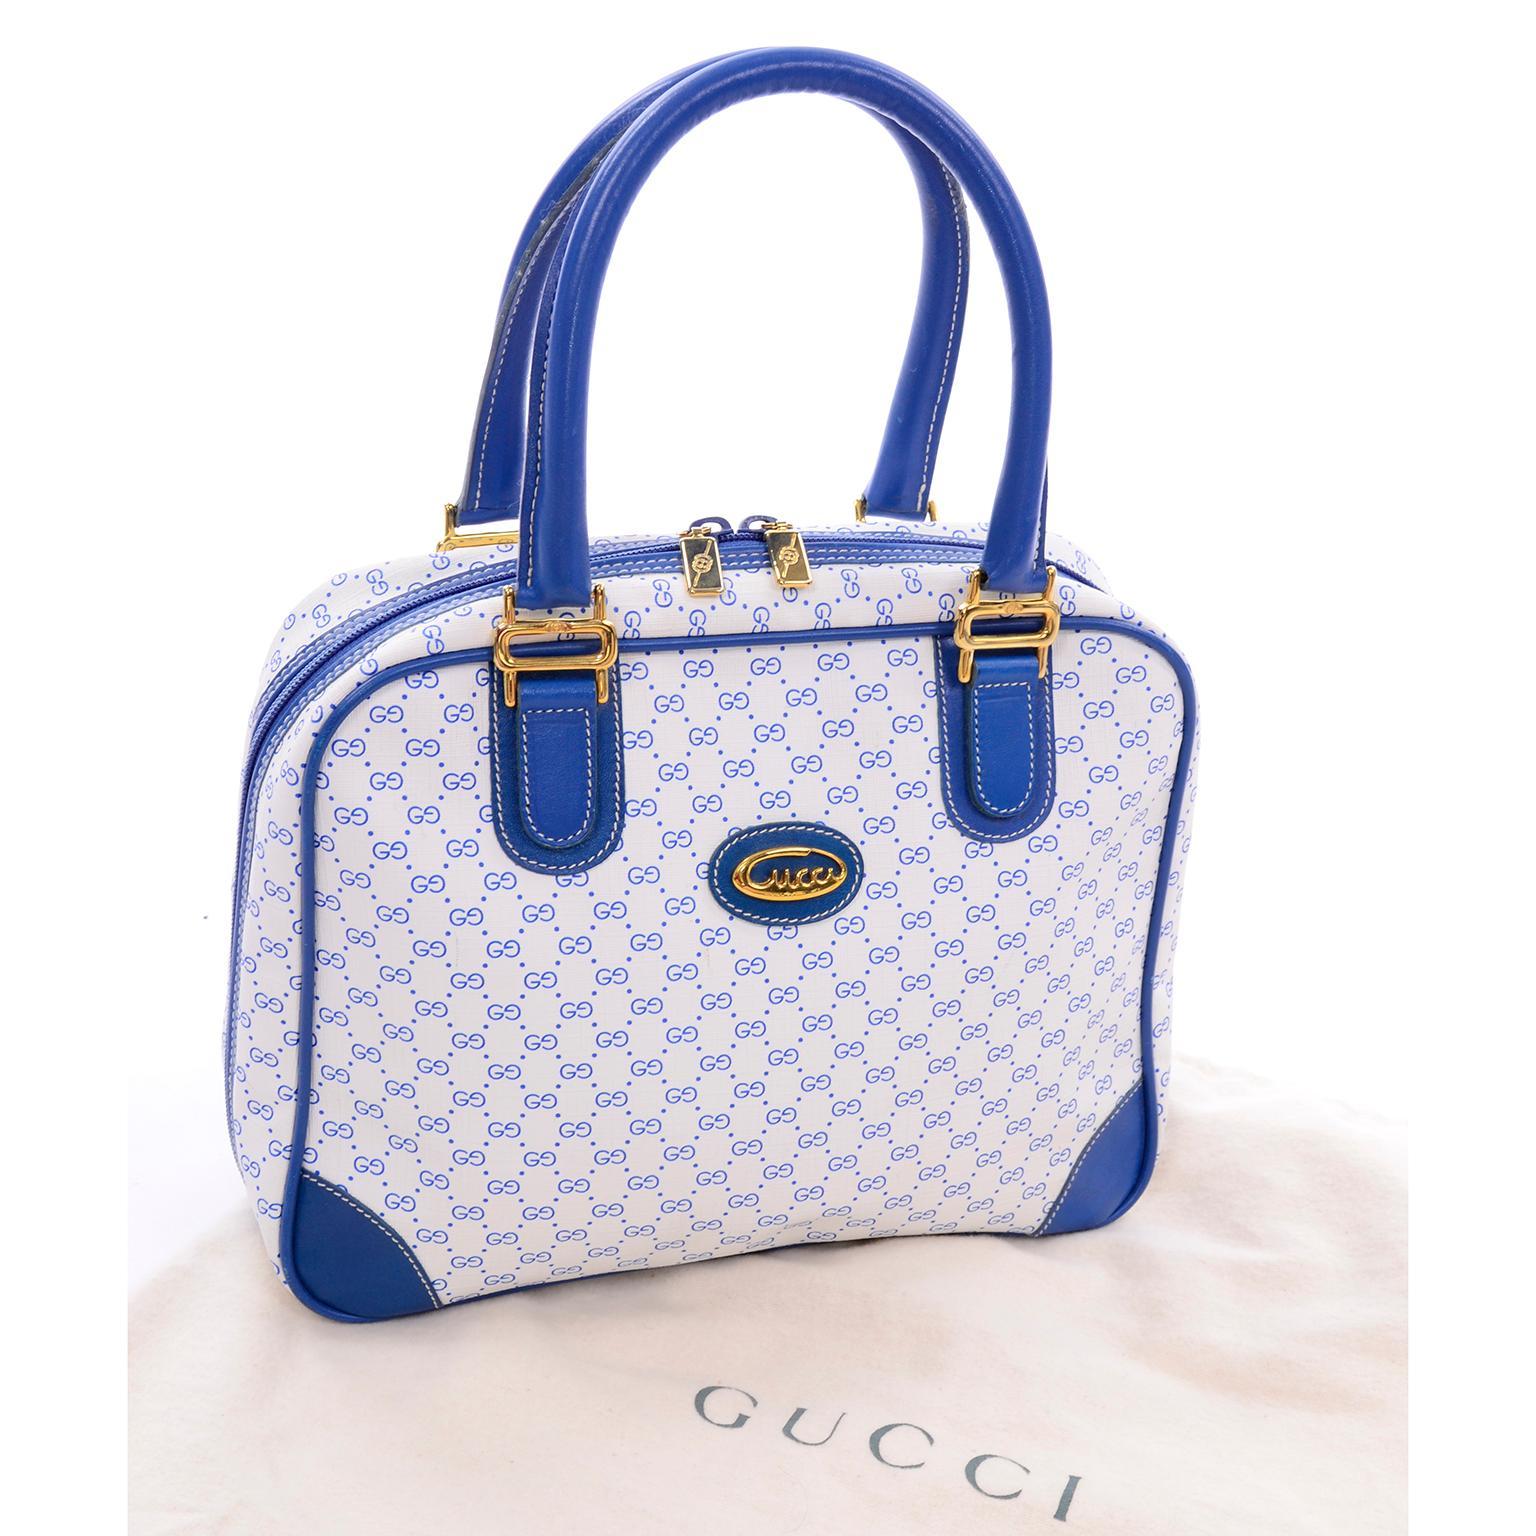 9c84b1cbb3464d Vintage Gucci Handbag Monogram Boston Bag in Bright Blue and White W/  Script Logo For Sale at 1stdibs